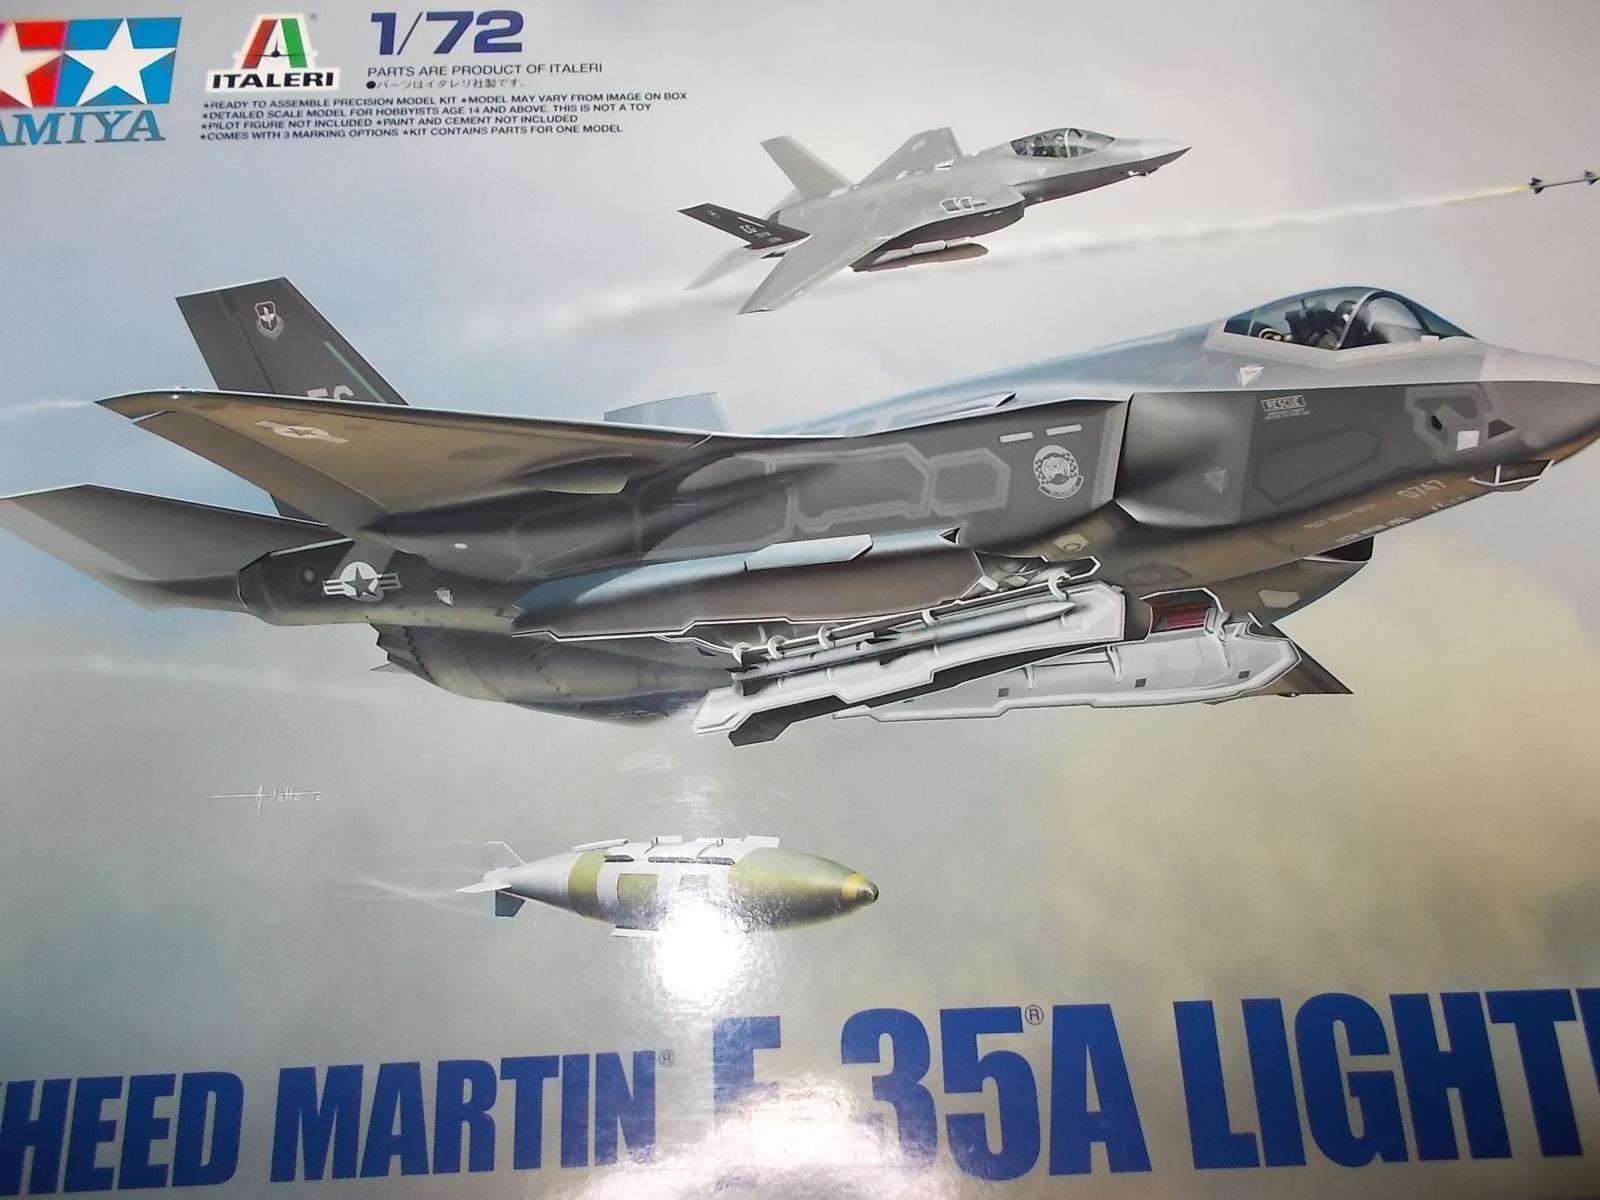 F35ステルス機、岩国配備=米国外で初・海兵隊―対北朝鮮、中国にらみ_c0192503_056593.jpg